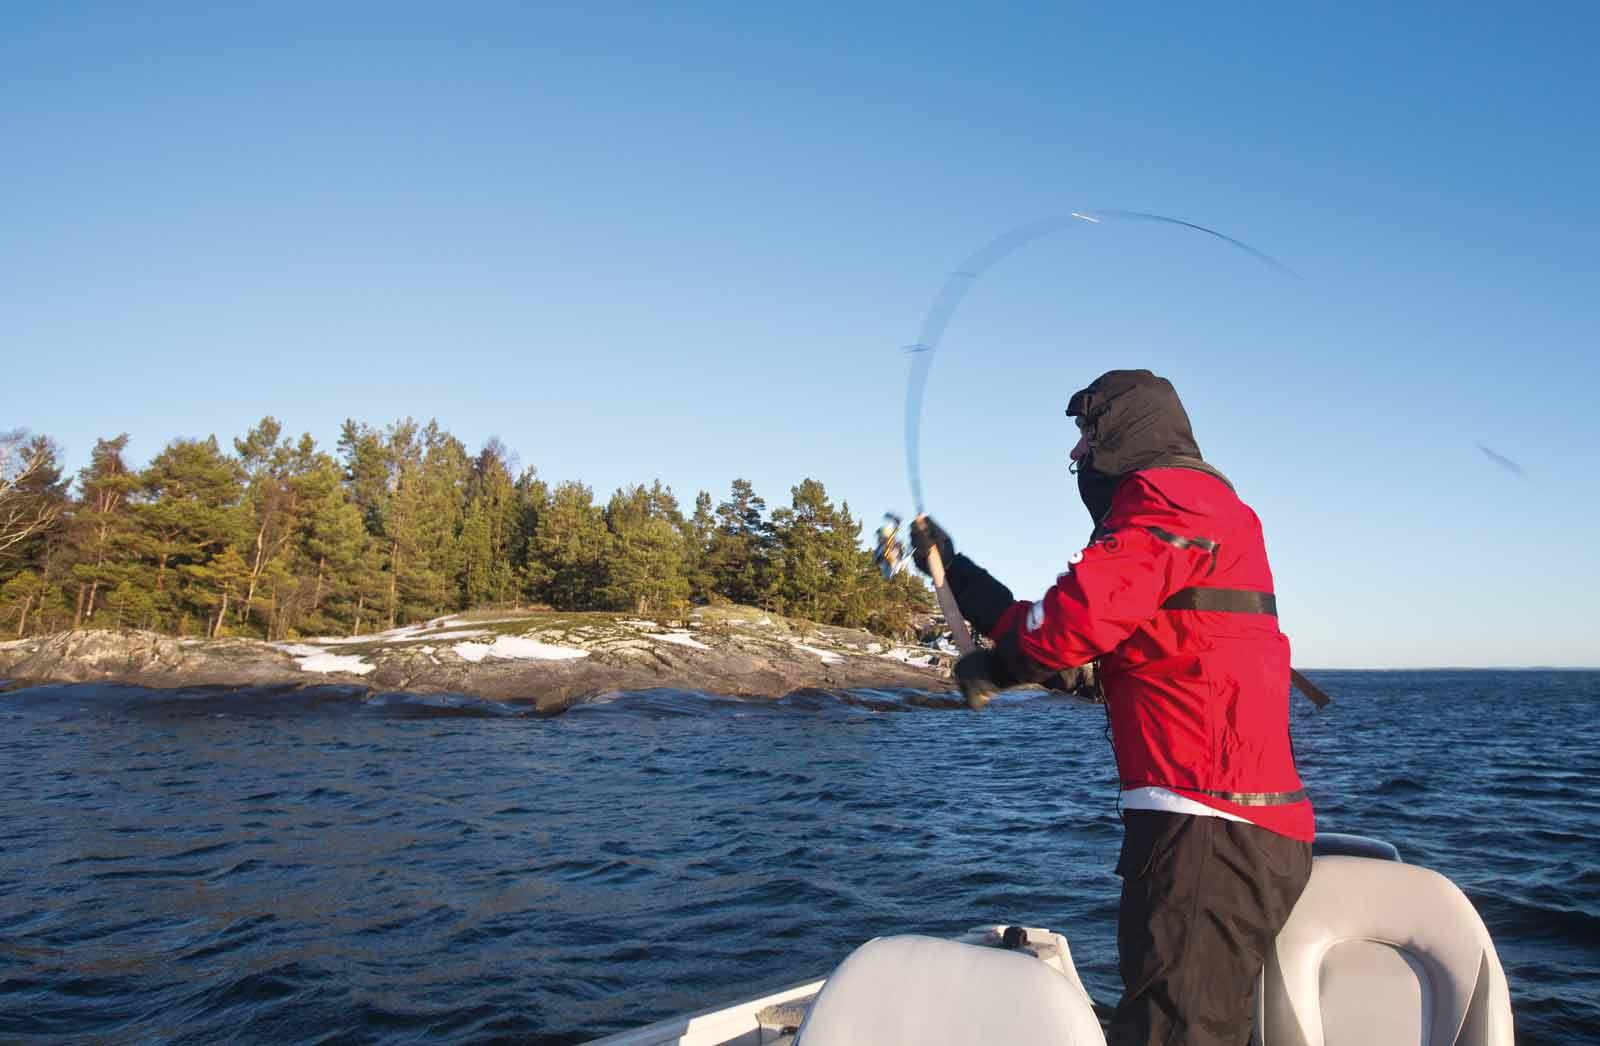 Fiskeri med tørdragt